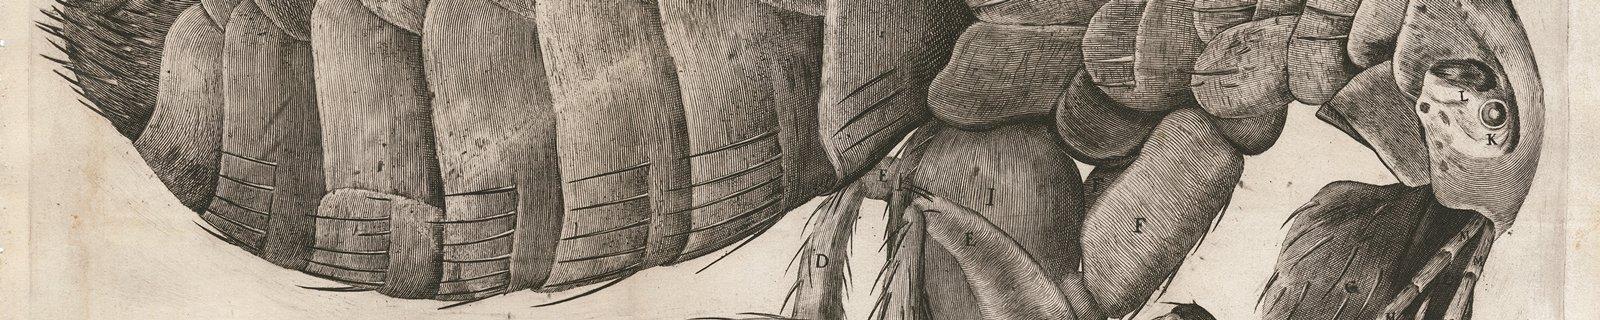 Flea from Micrographia